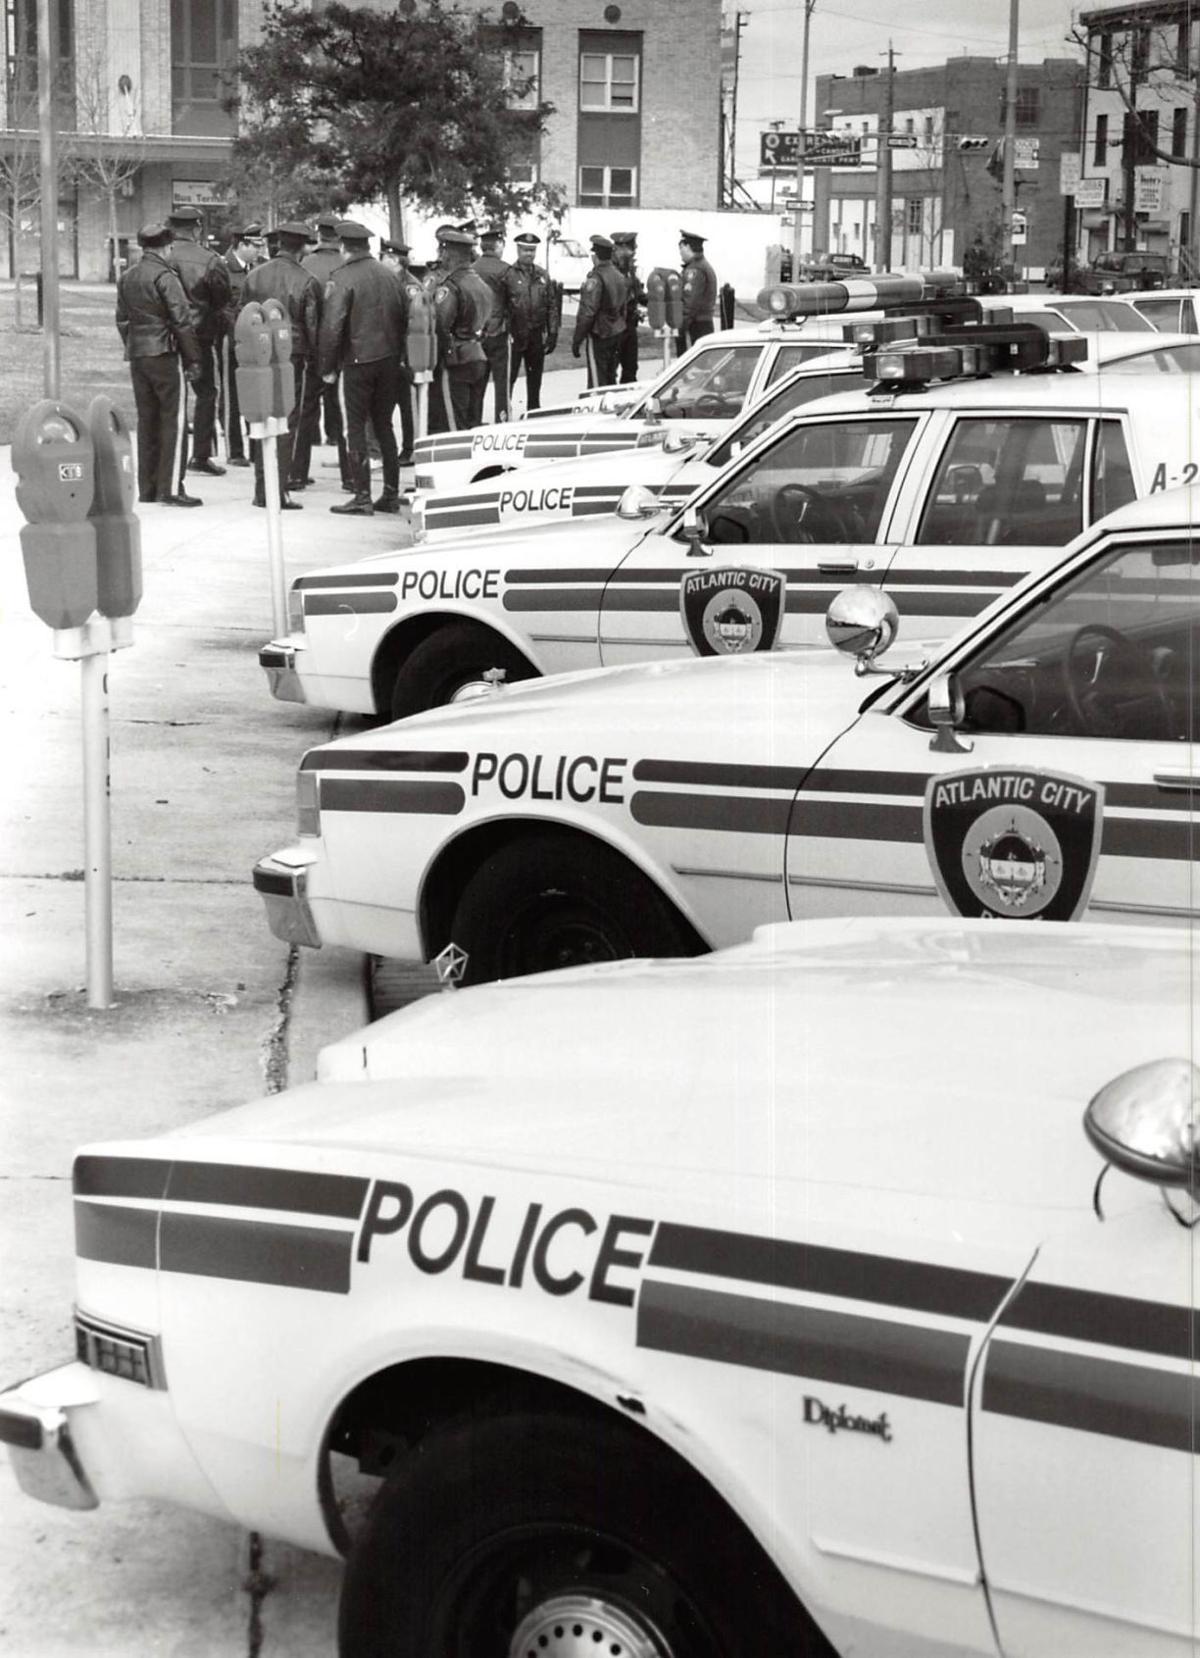 Atlantic City Police Department 1990's